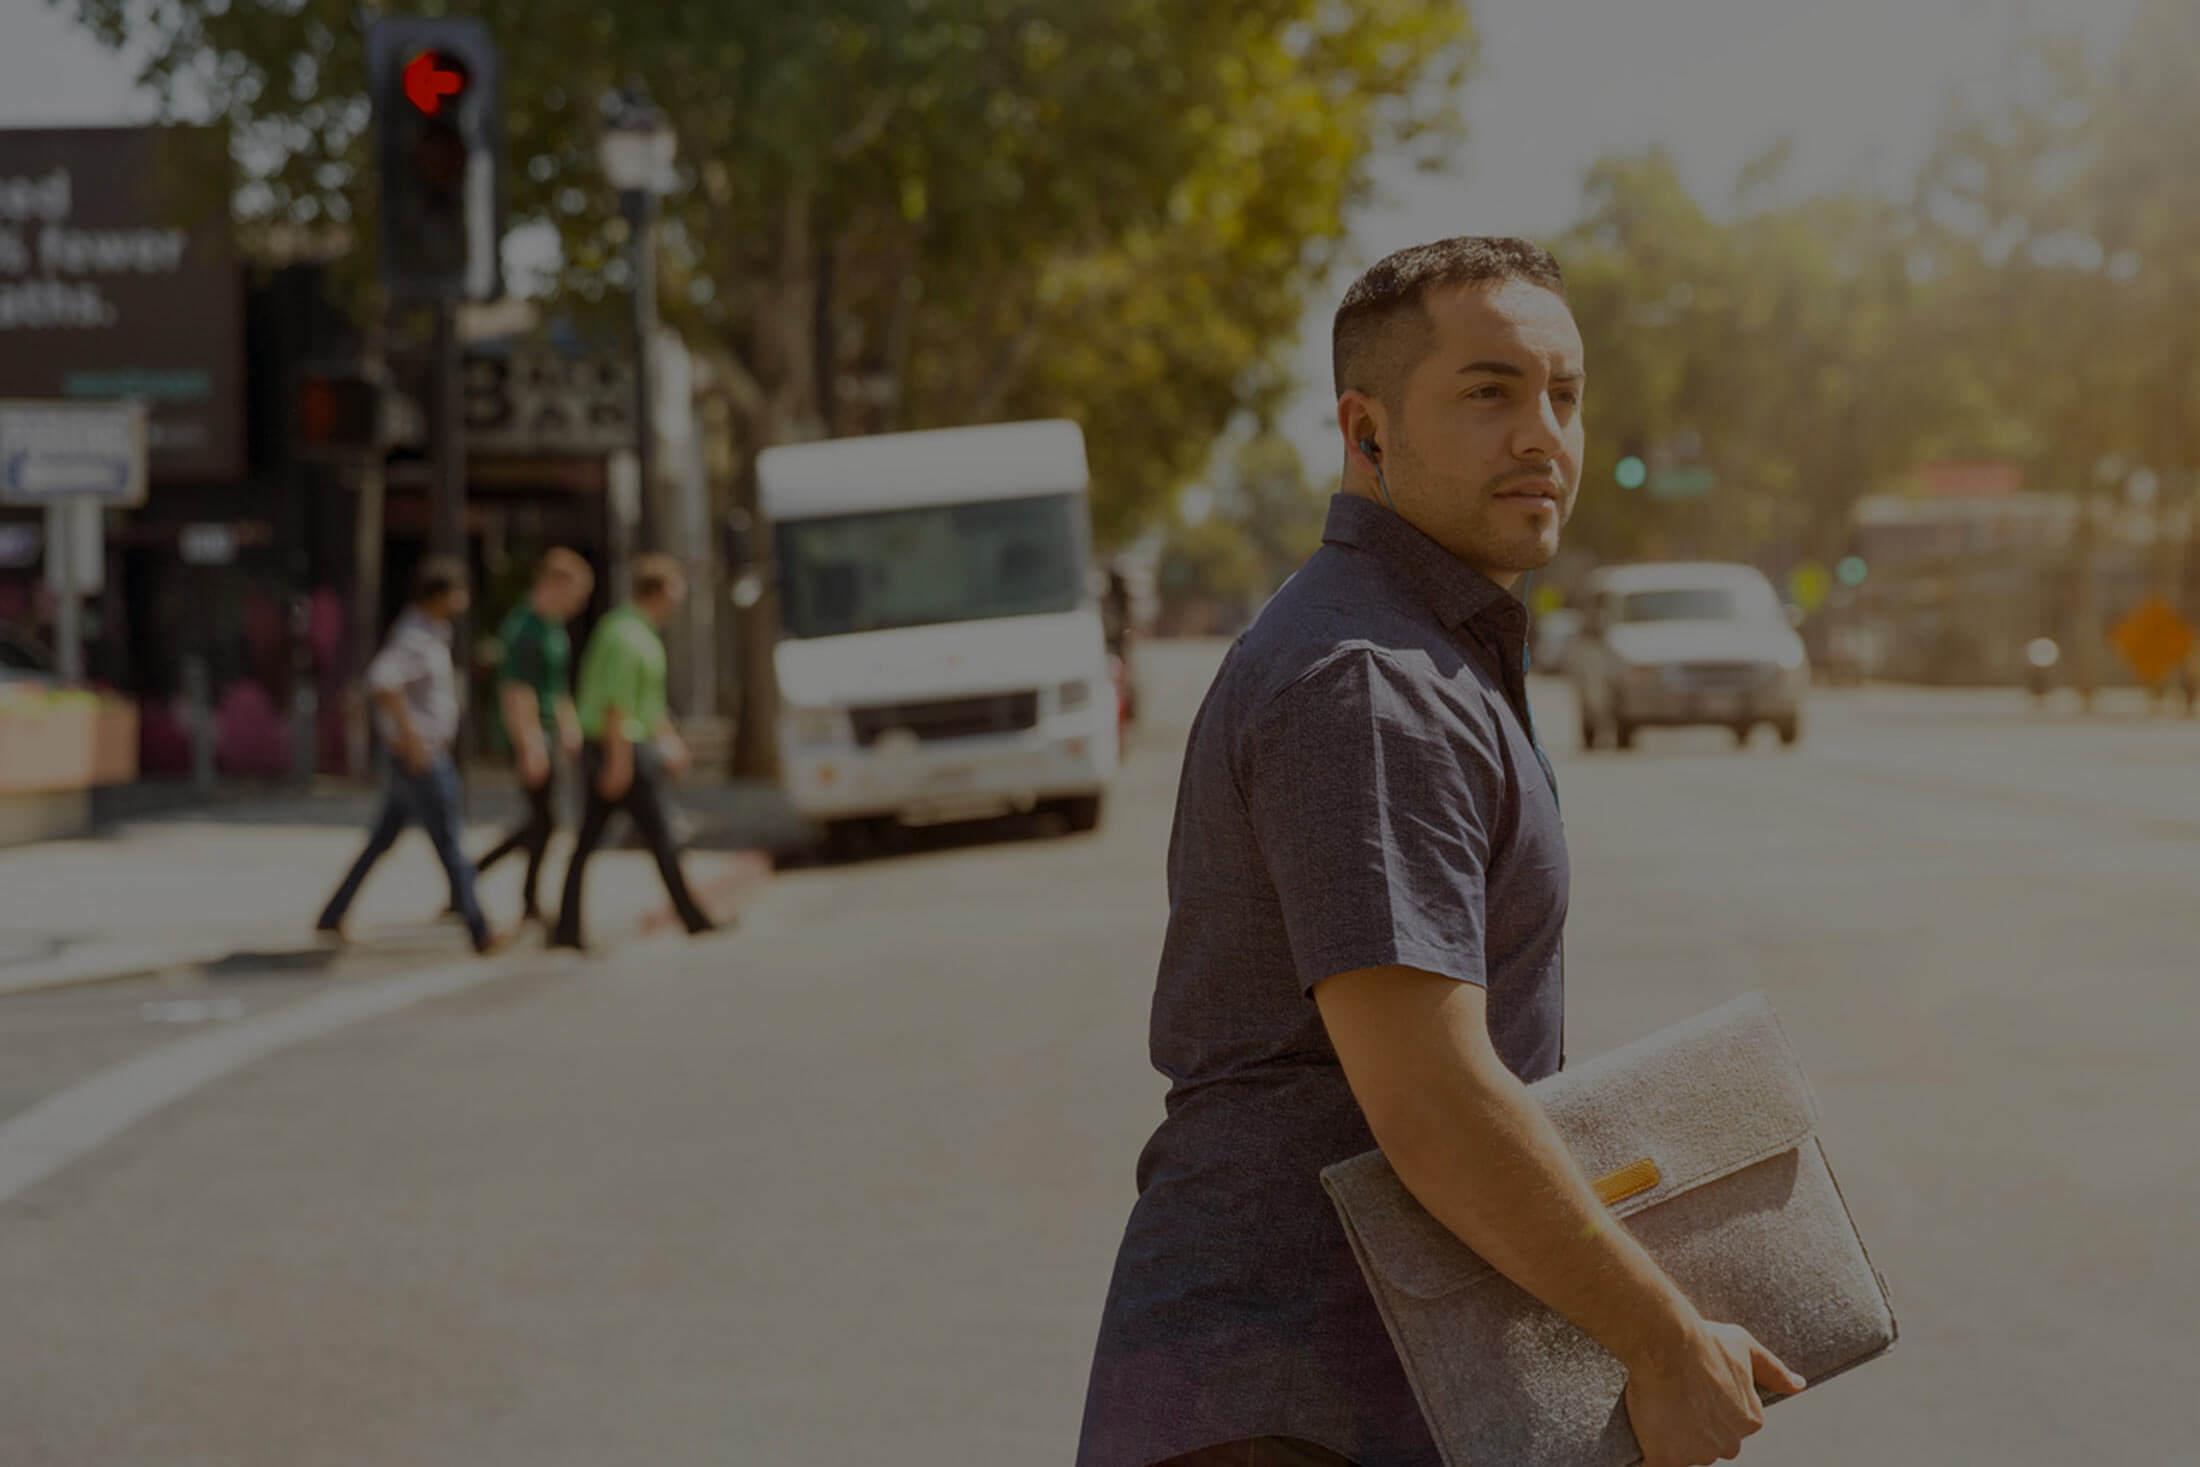 Pole emploi - offre emploi Chauffeur spl frigorifique (H/F) - Montauban